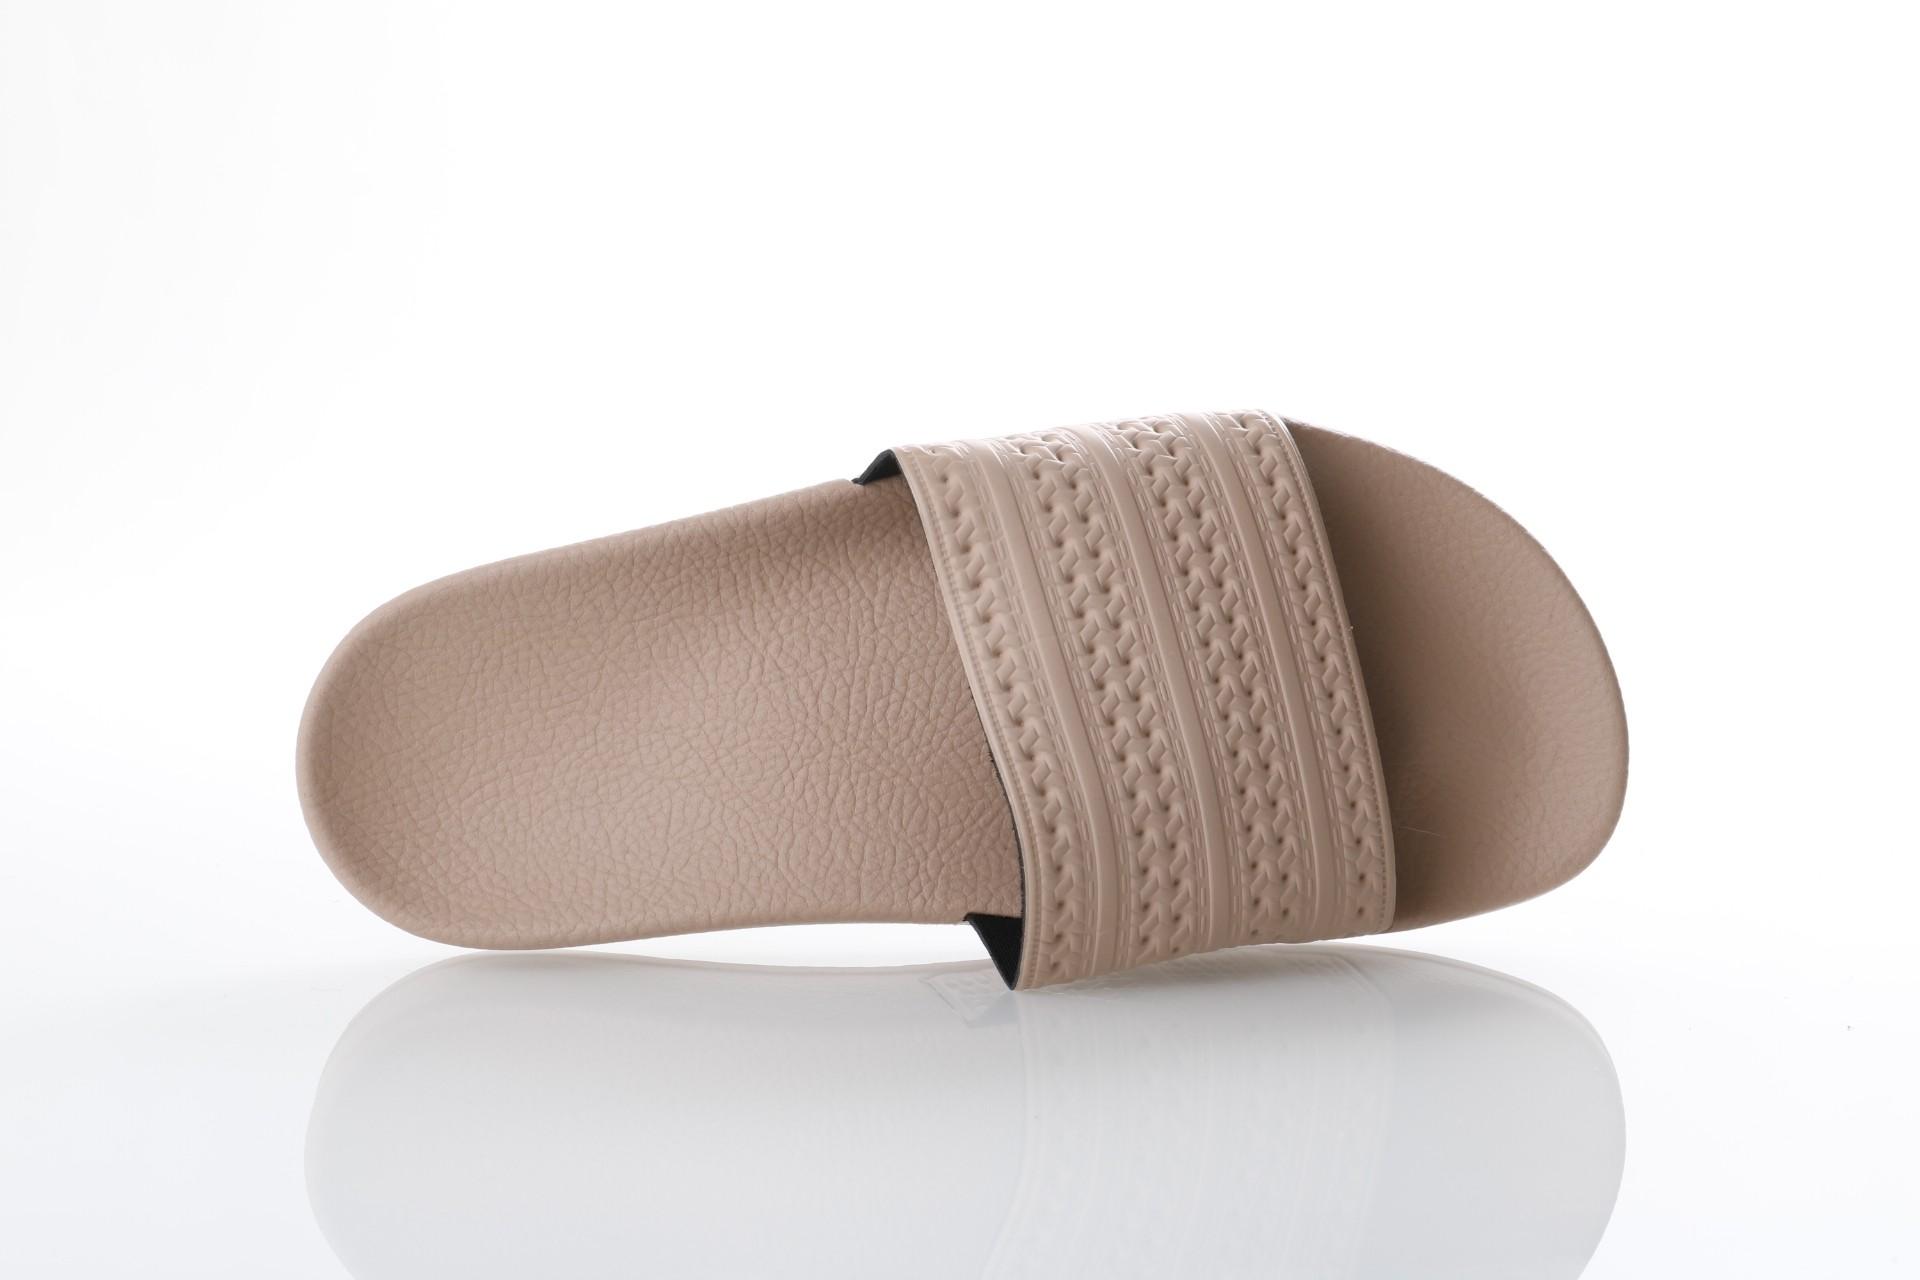 Afbeelding van Adidas Originals CQ2235 Slide sandal Adilette Grijs